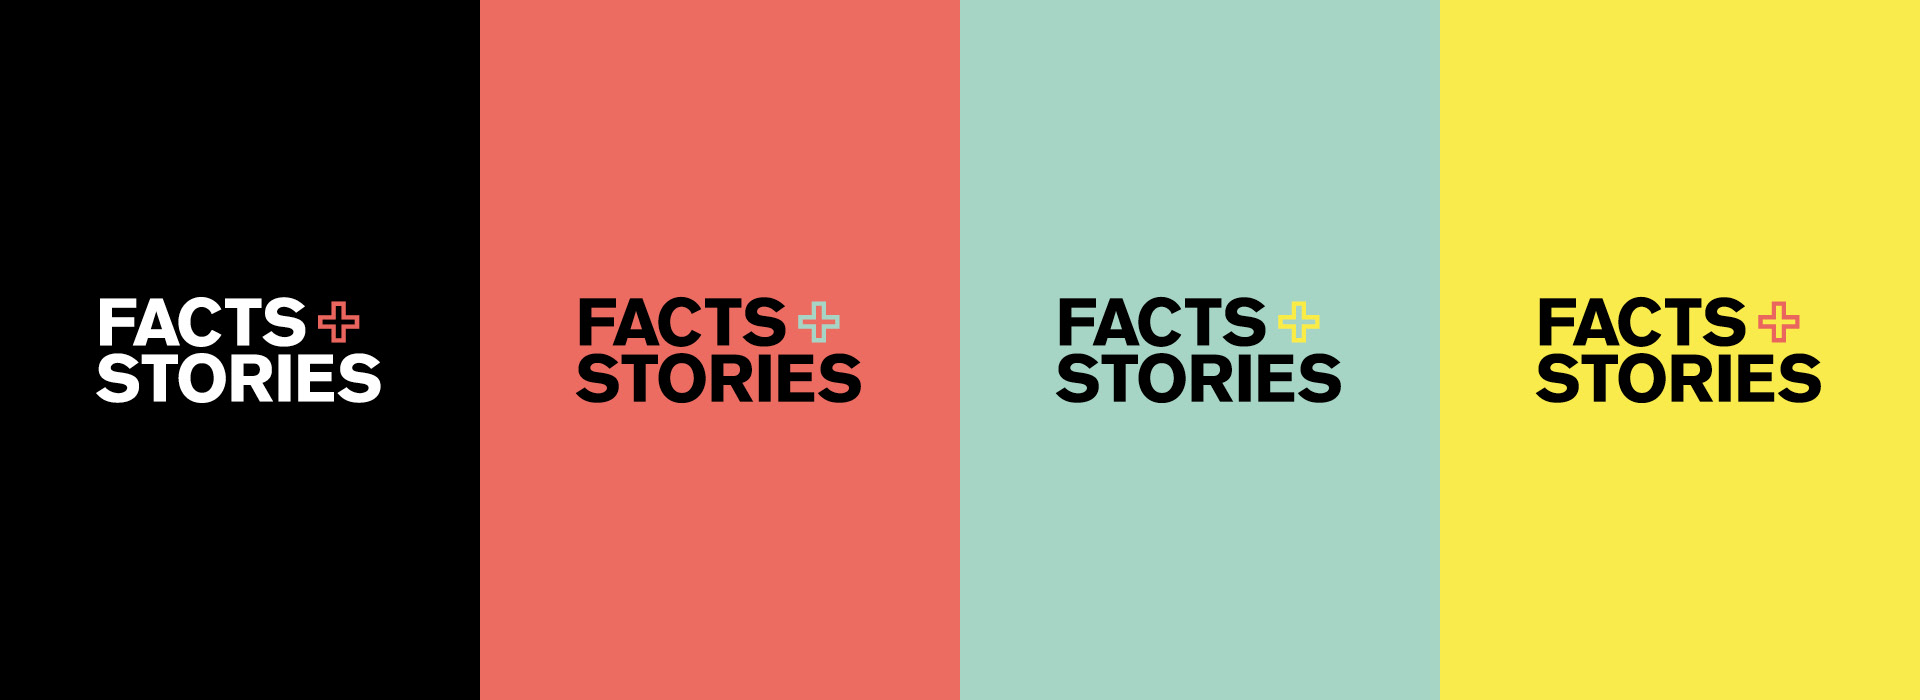 Facts+Stories Logo Farbvarianten